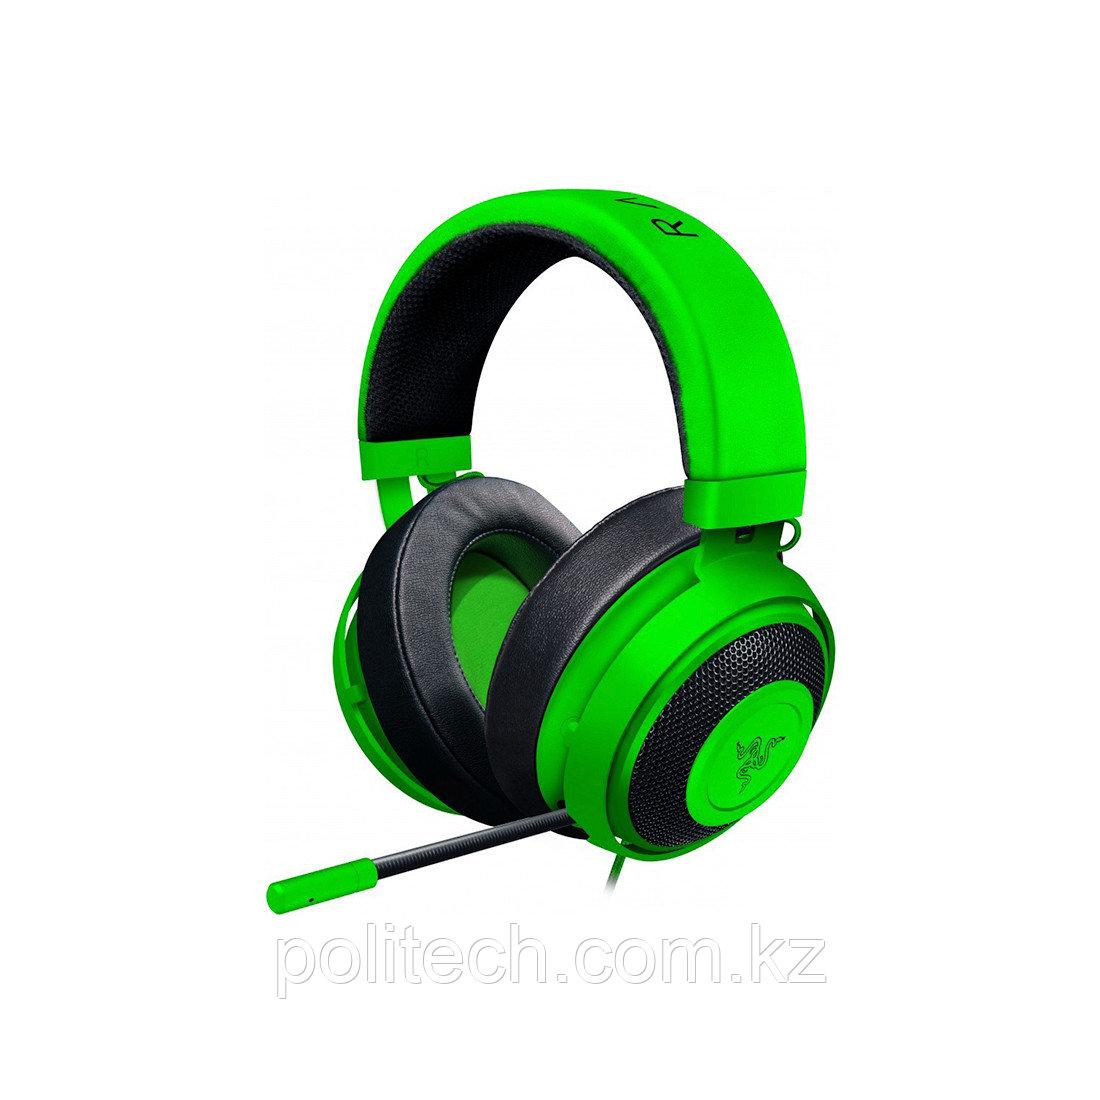 Гарнитура Razer Kraken Pro V2 Oval Green (3,5мм)